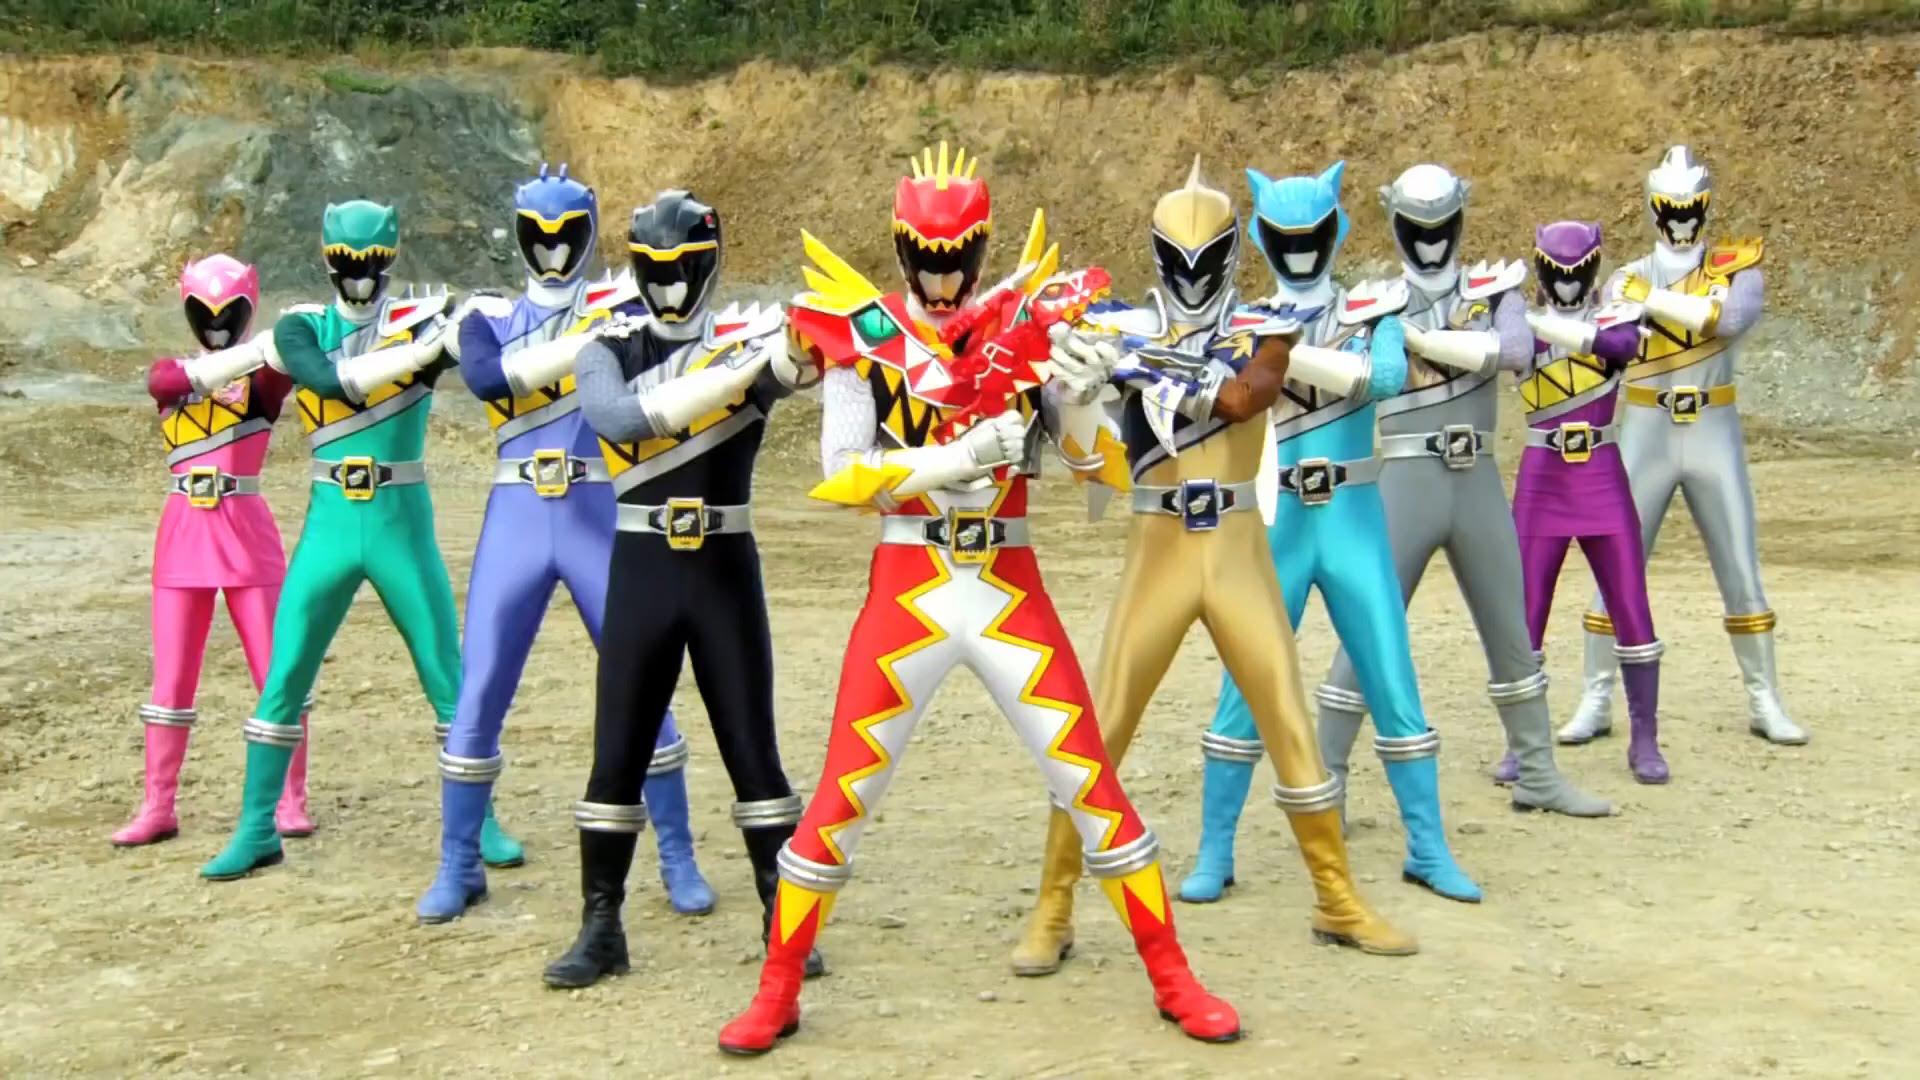 Fecha de estreno de Power Rangers Dino Super Charge y sinopsis de Ninja Steel